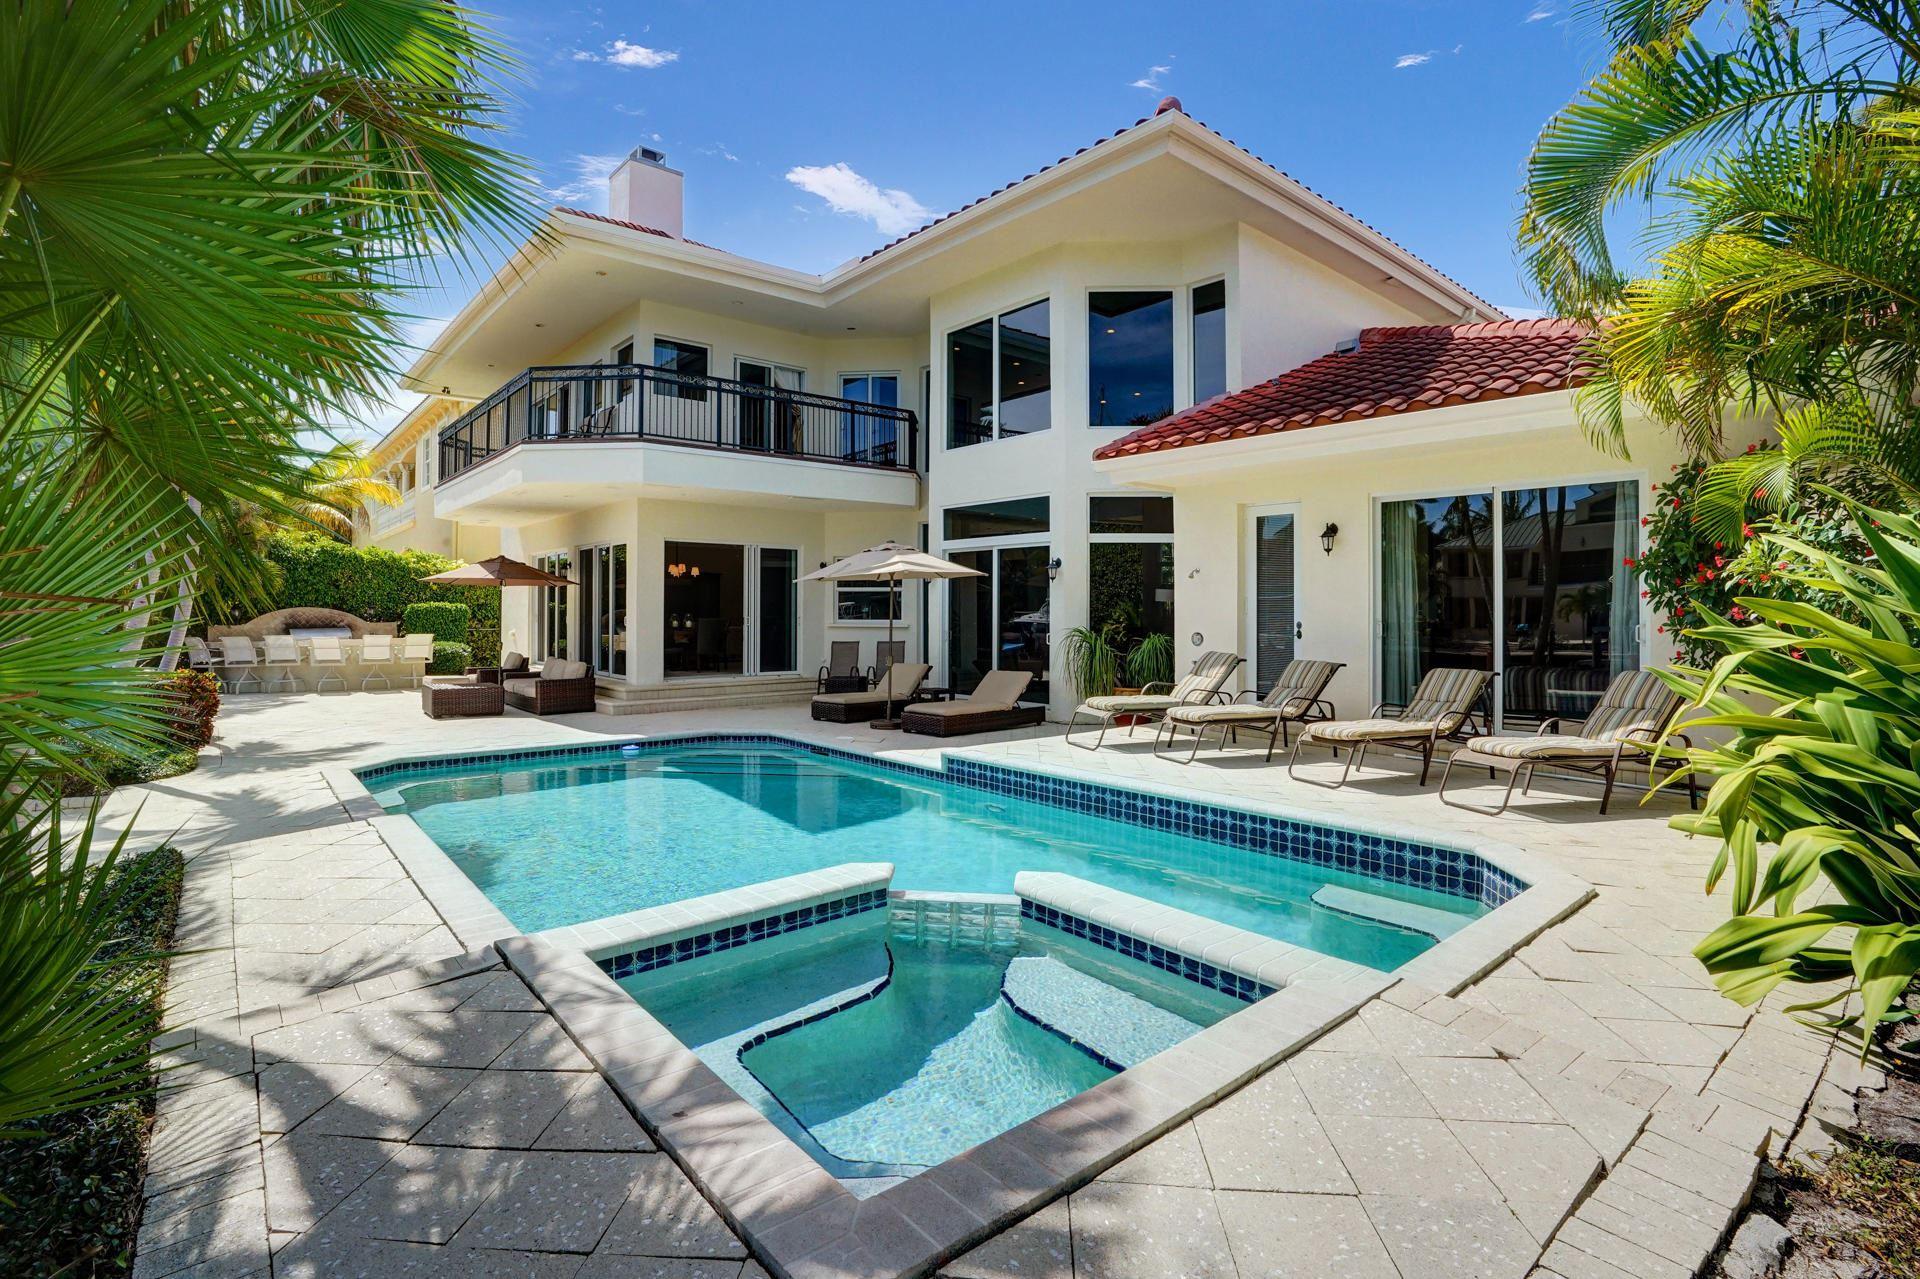 932 Hyacinth Drive, Delray Beach, FL 33483 - #: RX-10625741